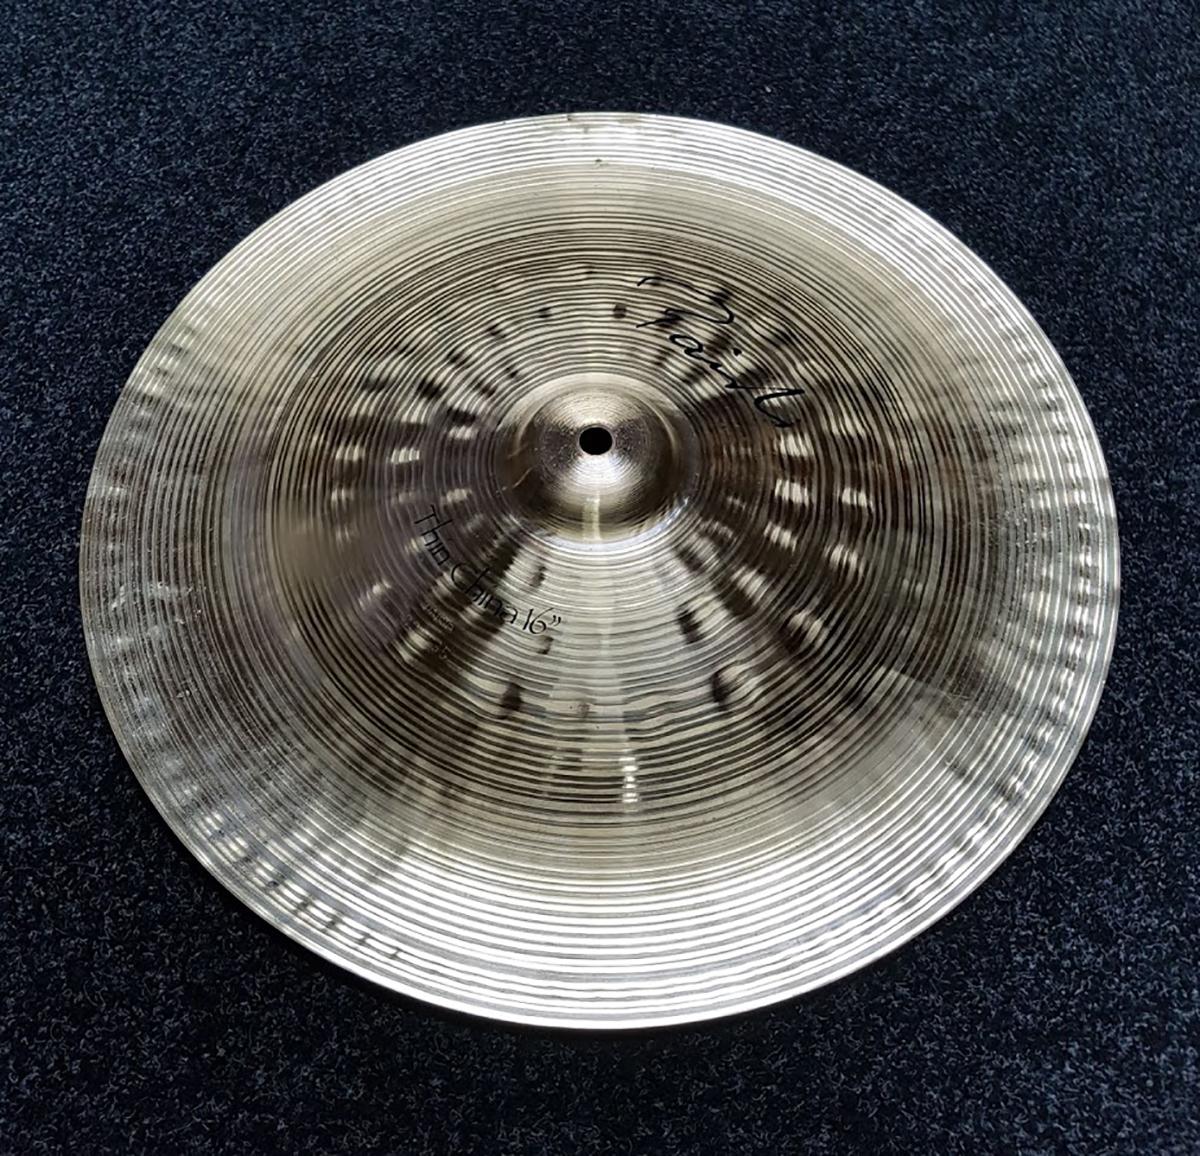 paiste 16 signature thin china cymbal used rkpc241018 ebay. Black Bedroom Furniture Sets. Home Design Ideas